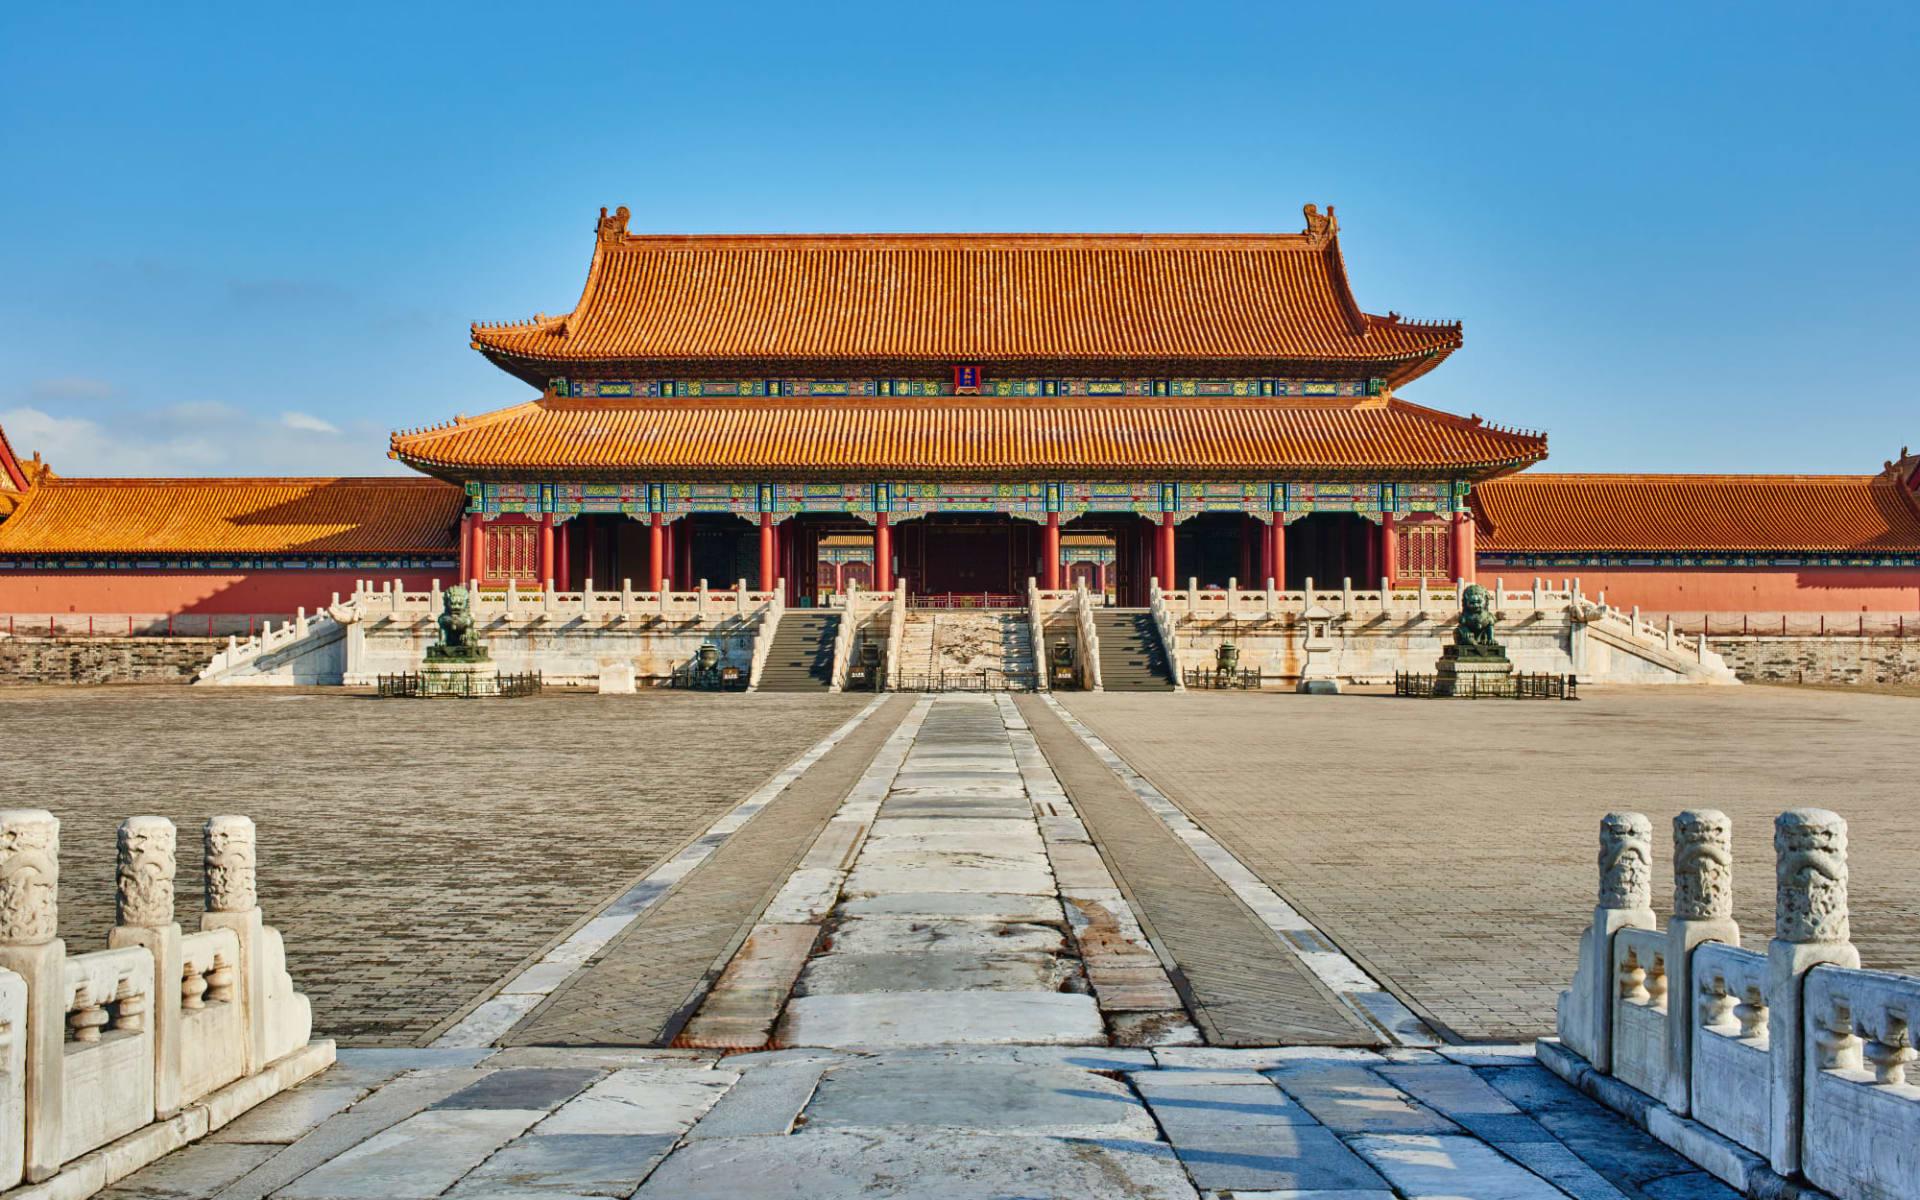 Hotel Waldorf Astoria in Peking:  Peking, verbotene Stadt